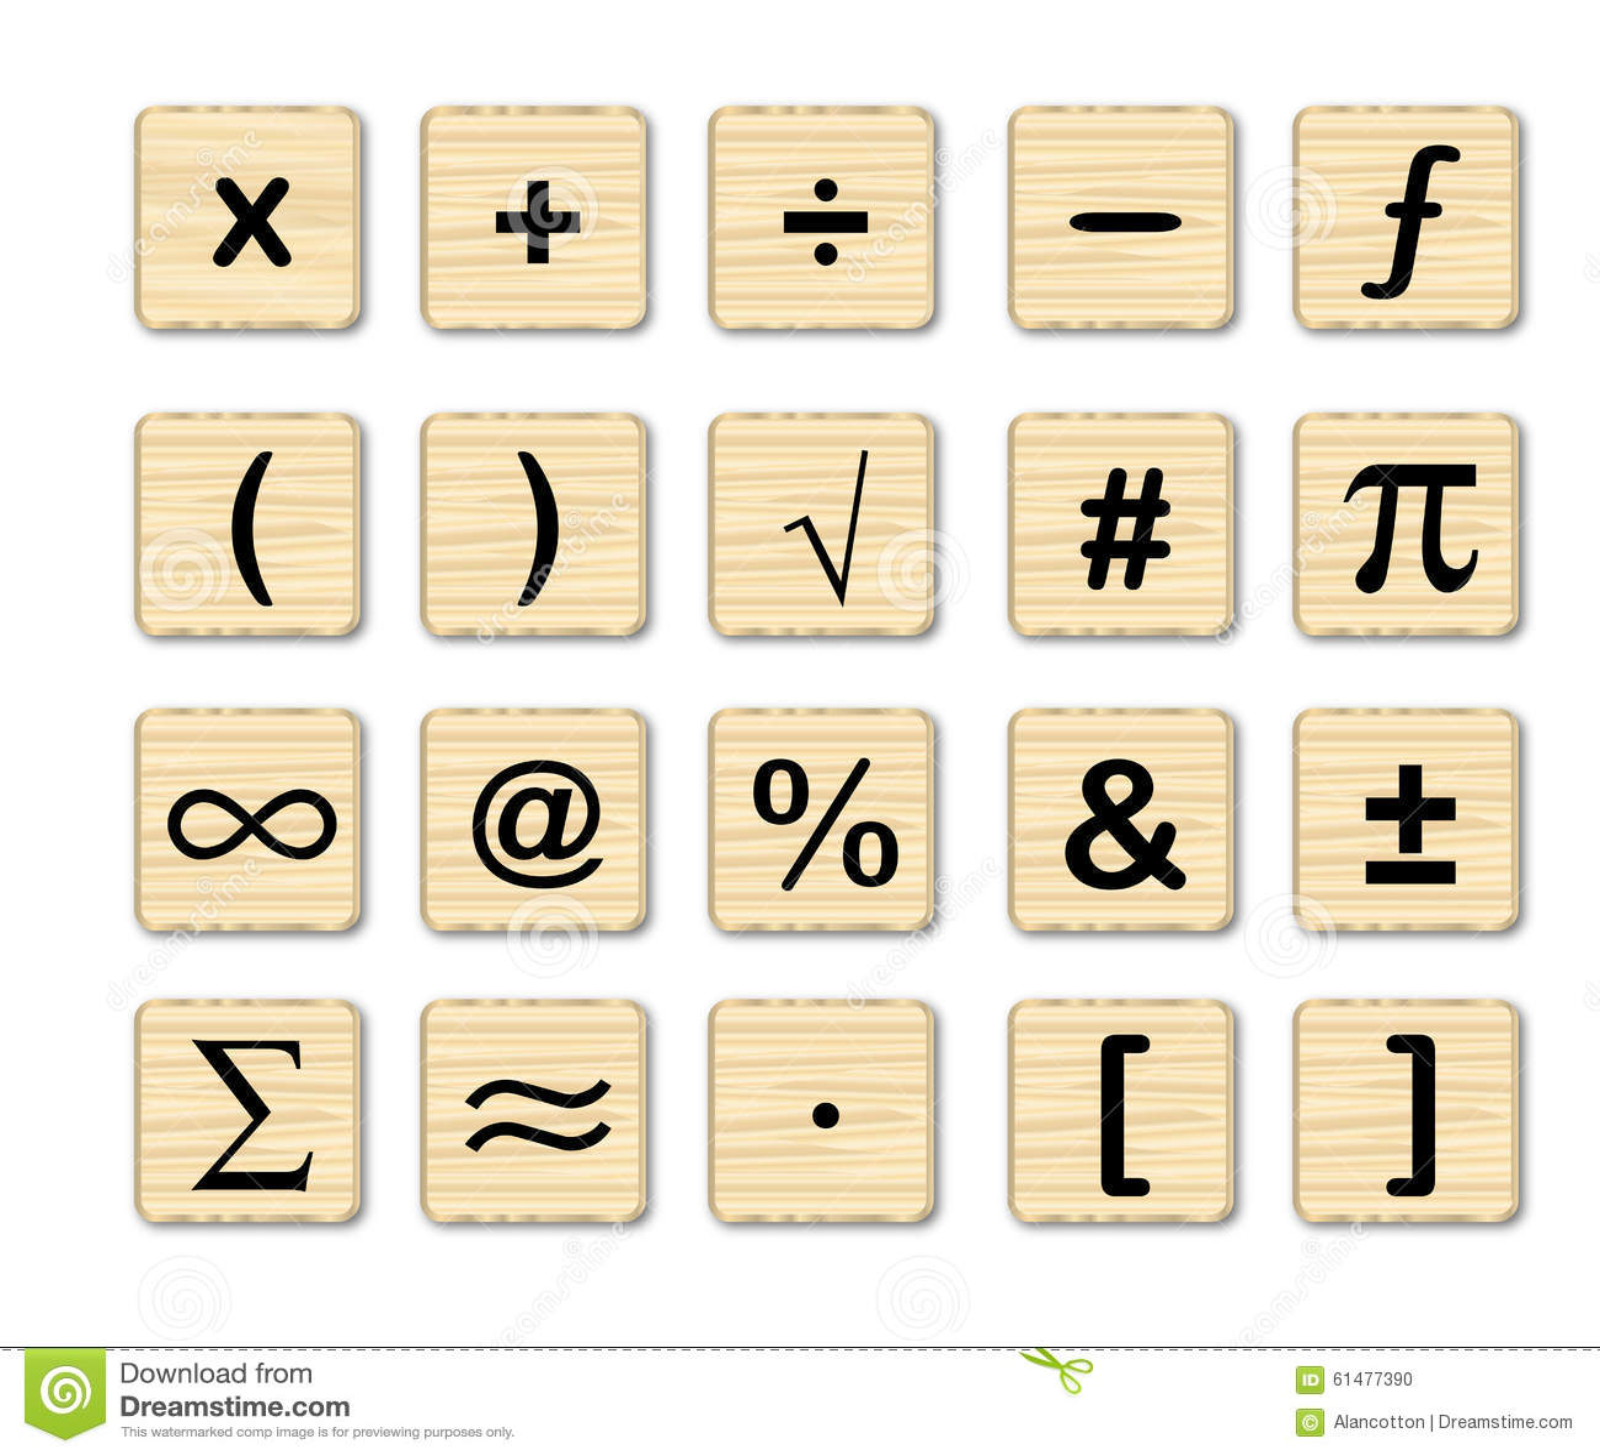 Wooden Math Symbols Stock Illustration Illustration Of Board 61477390